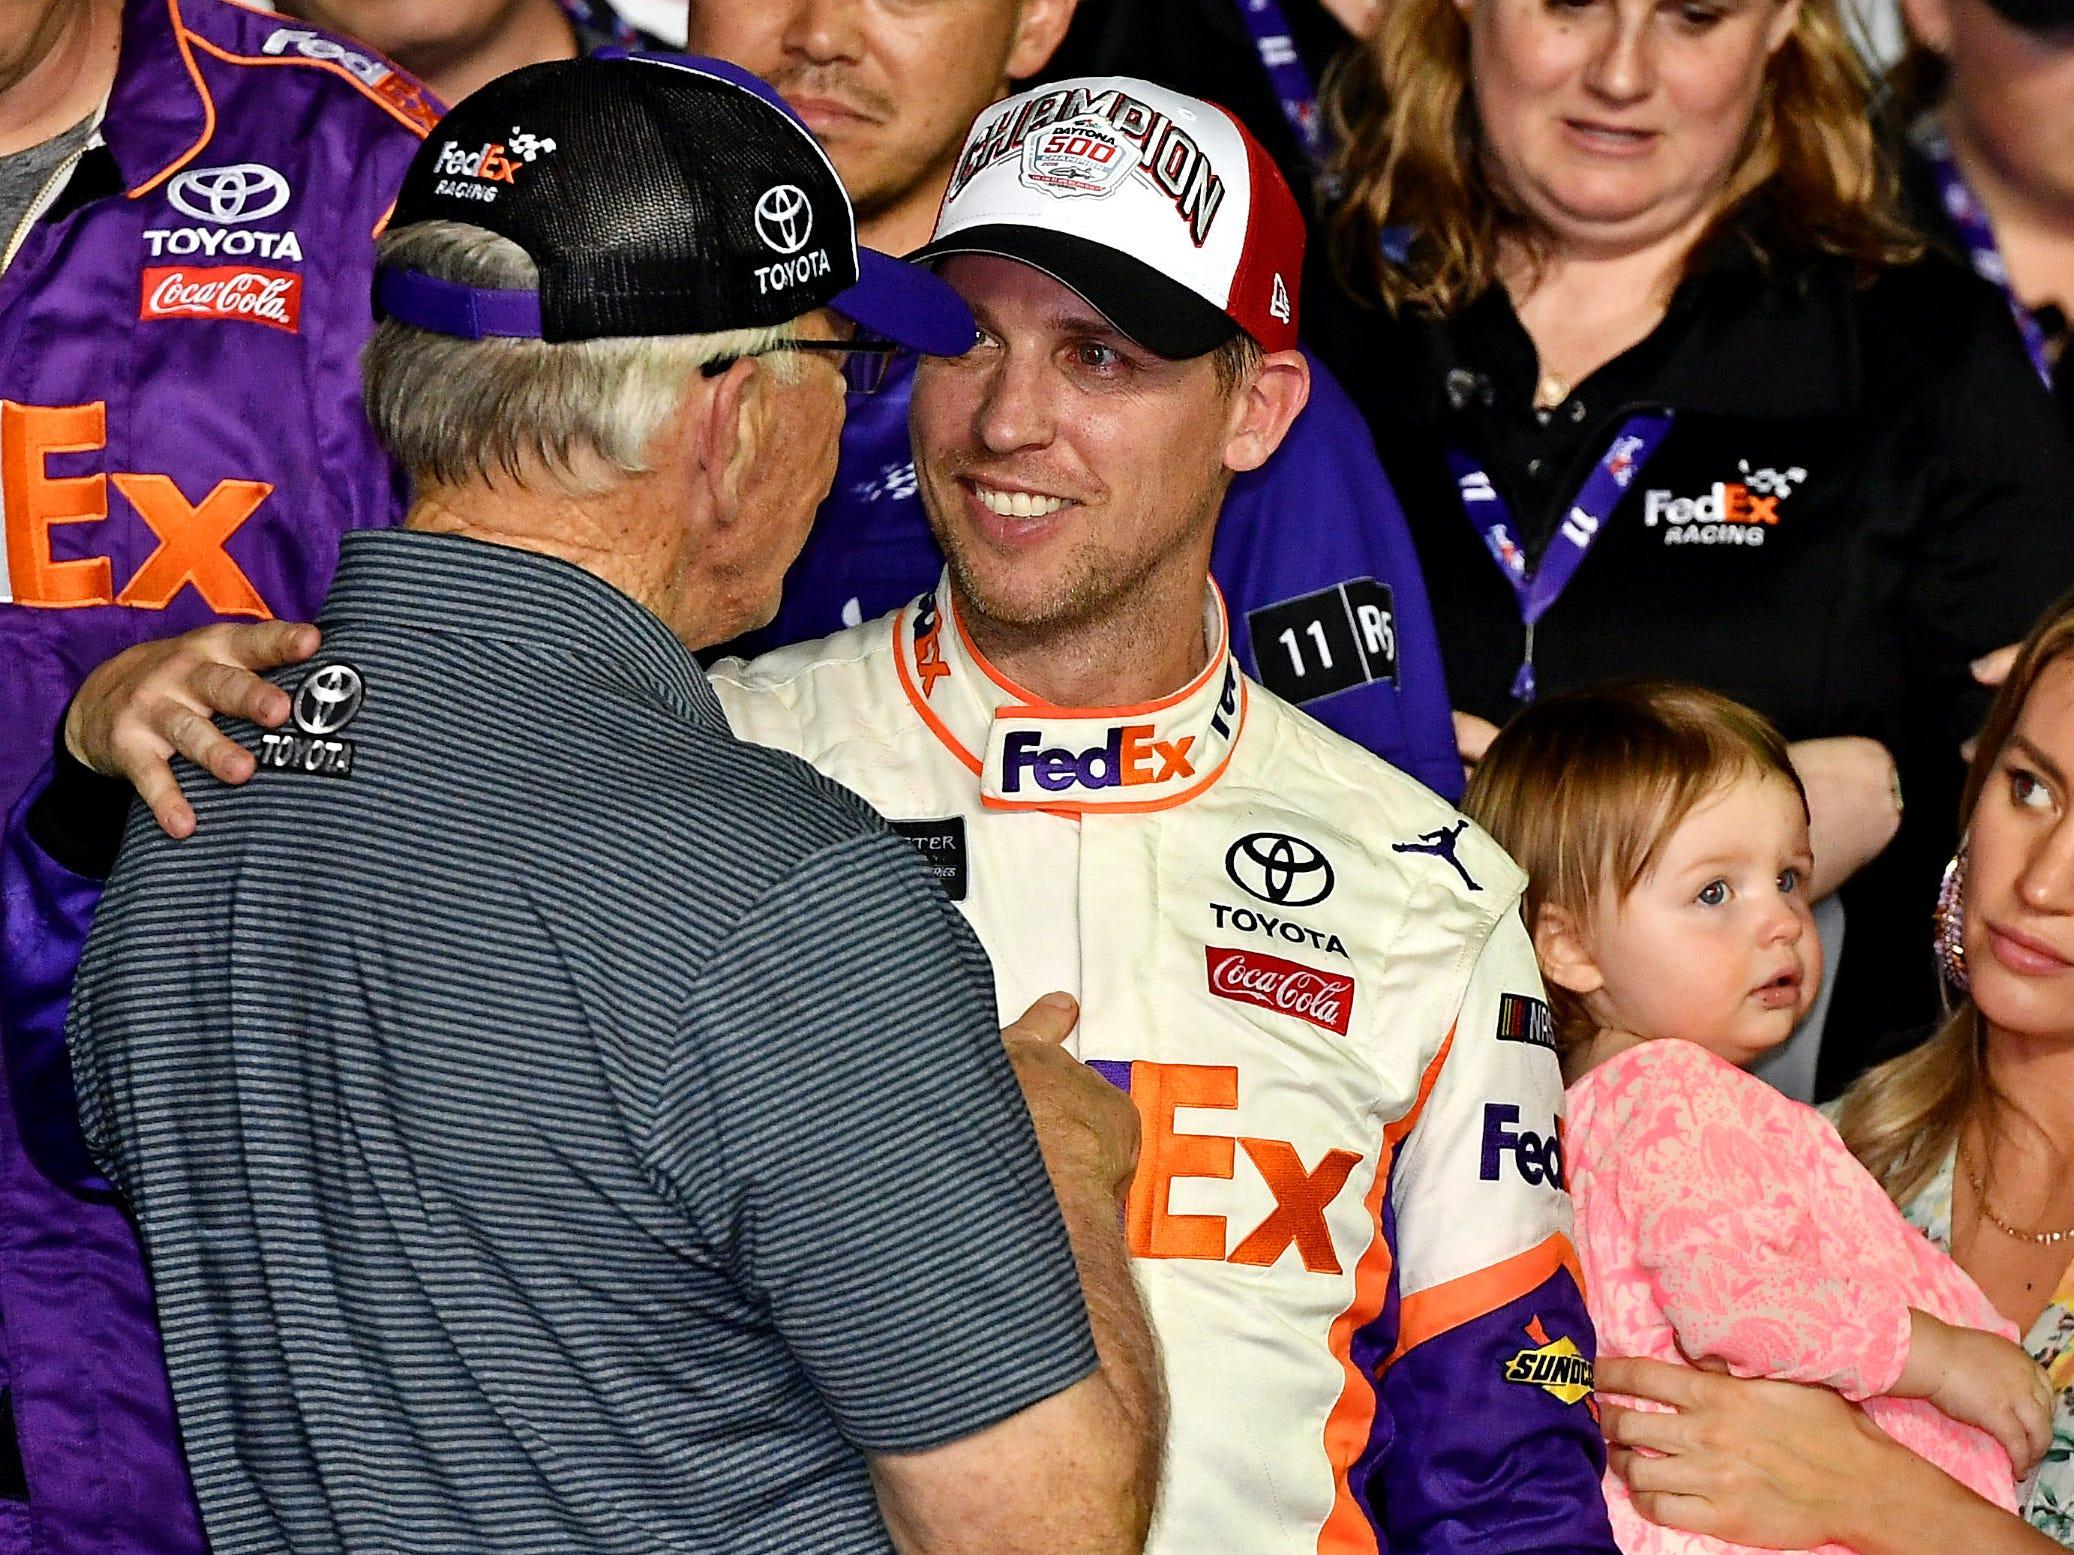 Joe Gibbs calls Denny Hamlin's Daytona 500 victory his 'most emotional' and 'biggest win'